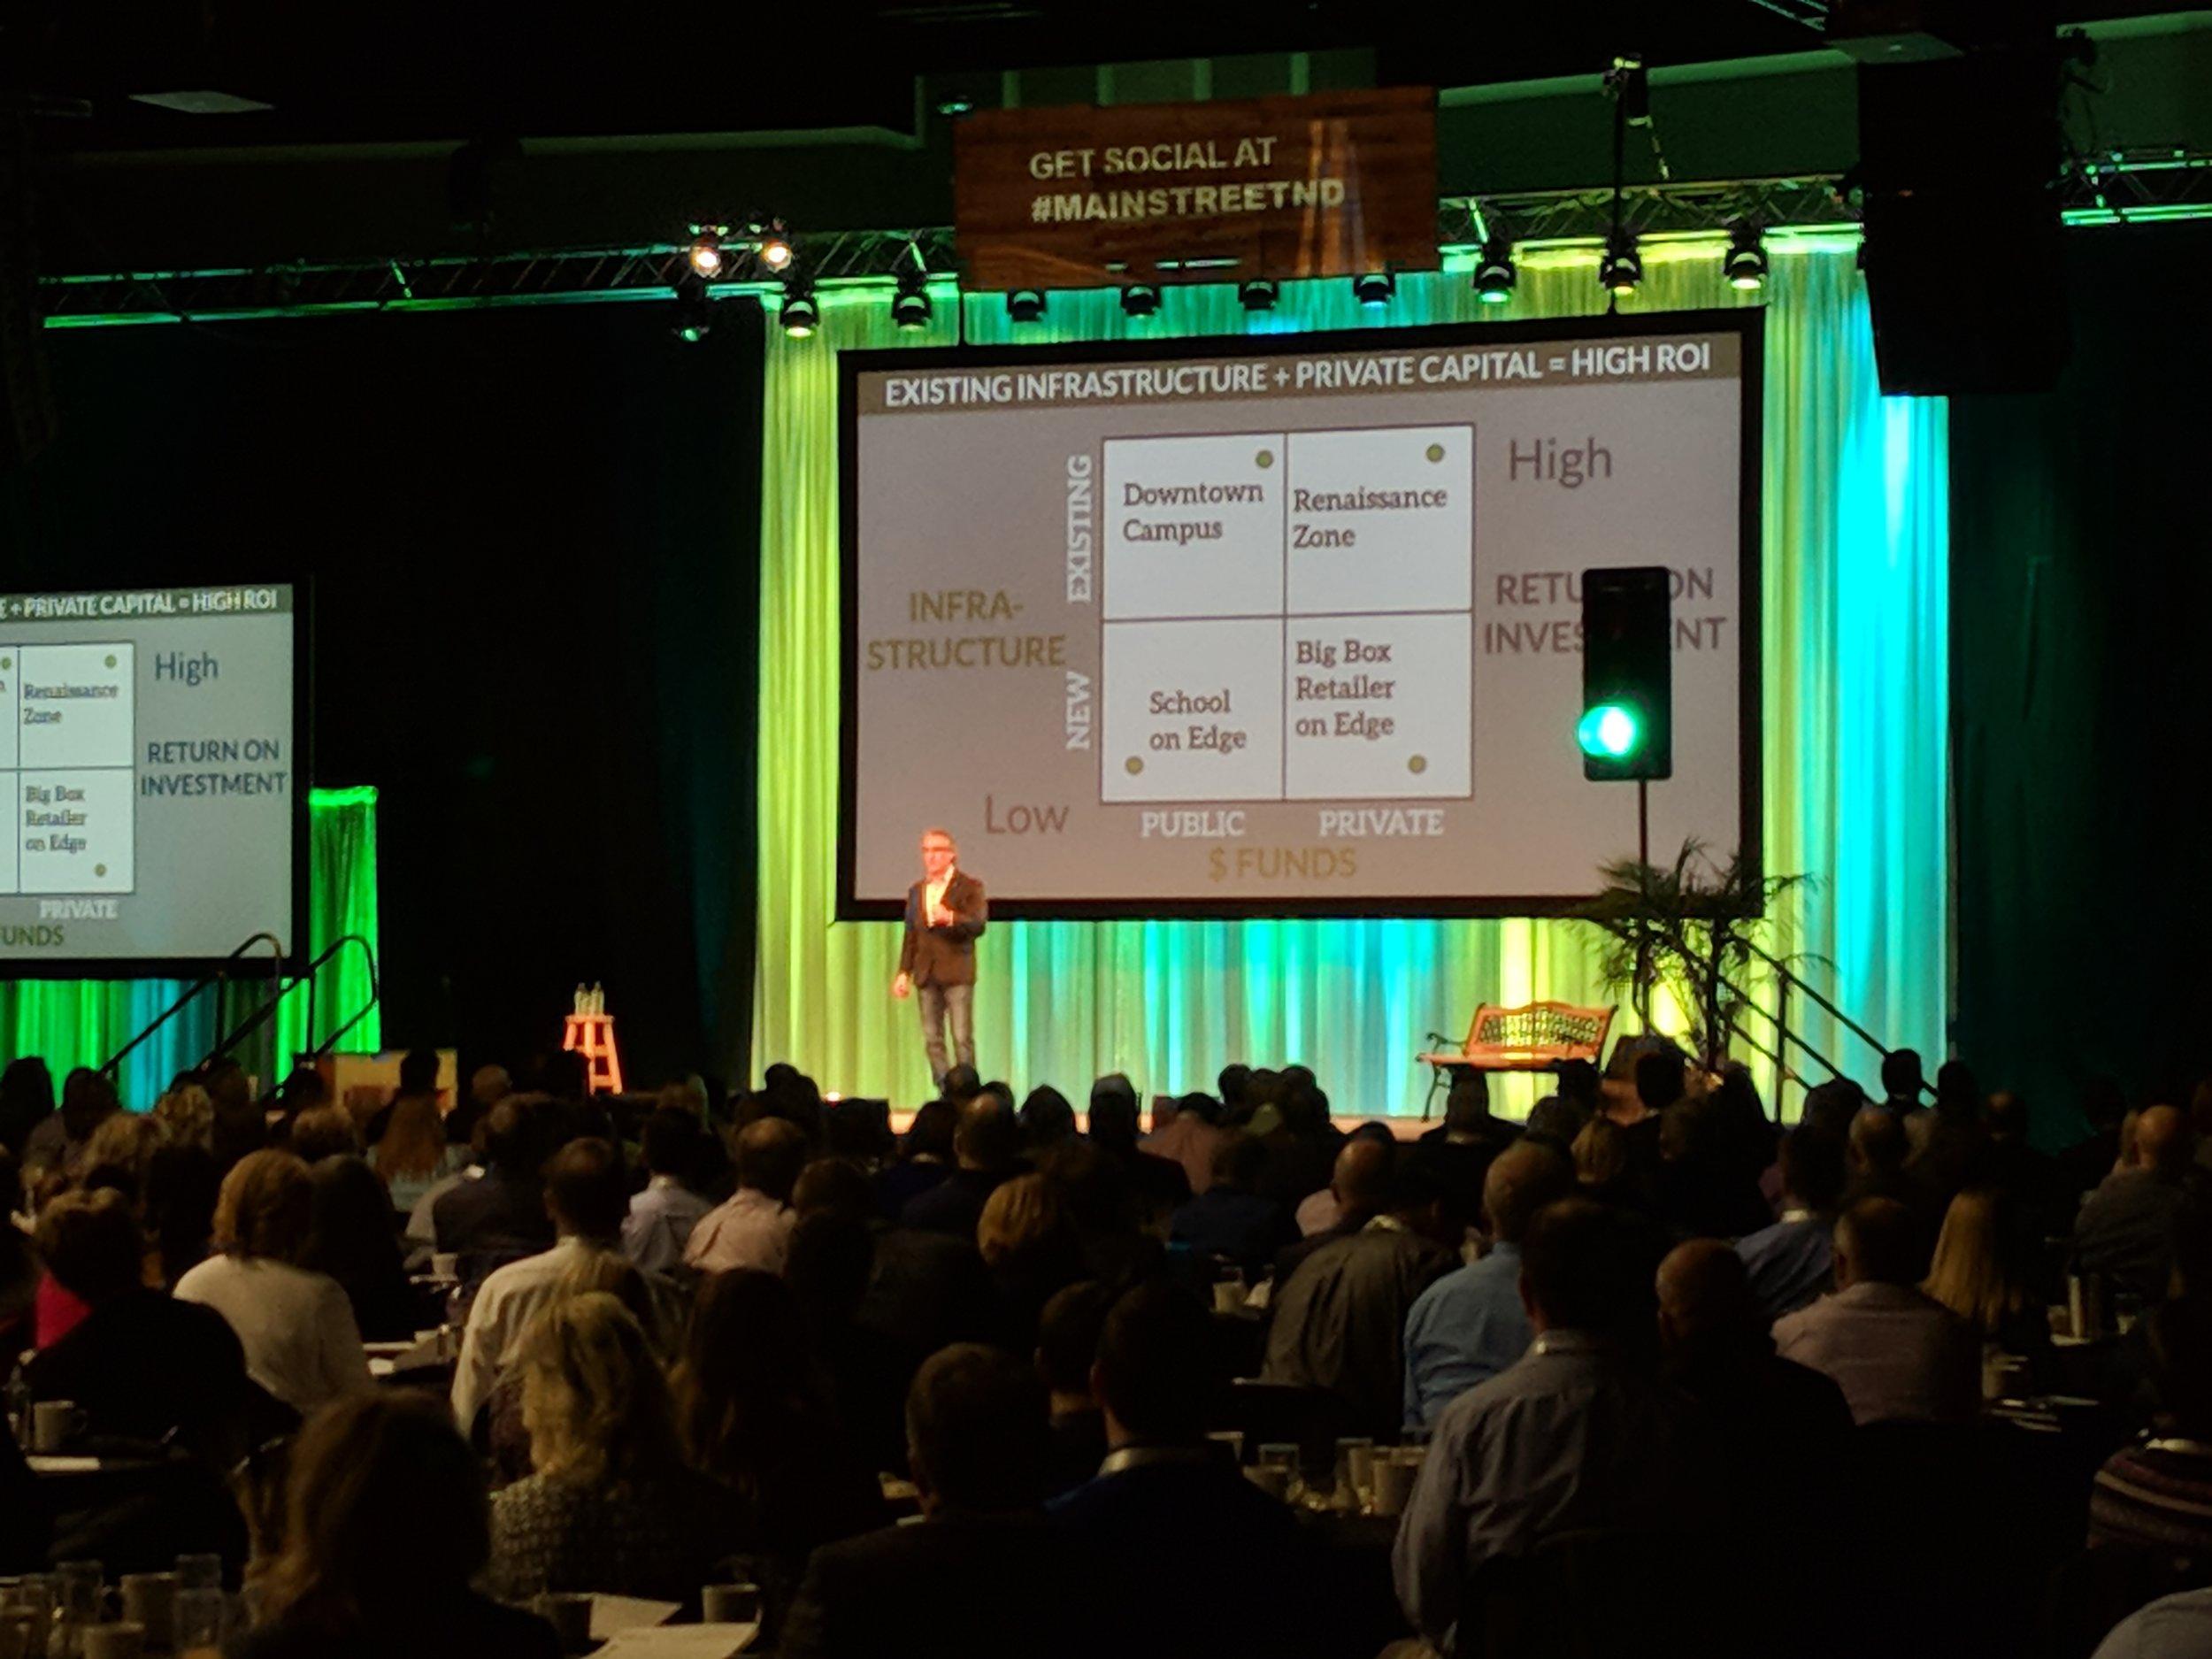 North Dakota Governor Doug Burgum presents at the Main Street ND Summit with Chuck Marohn